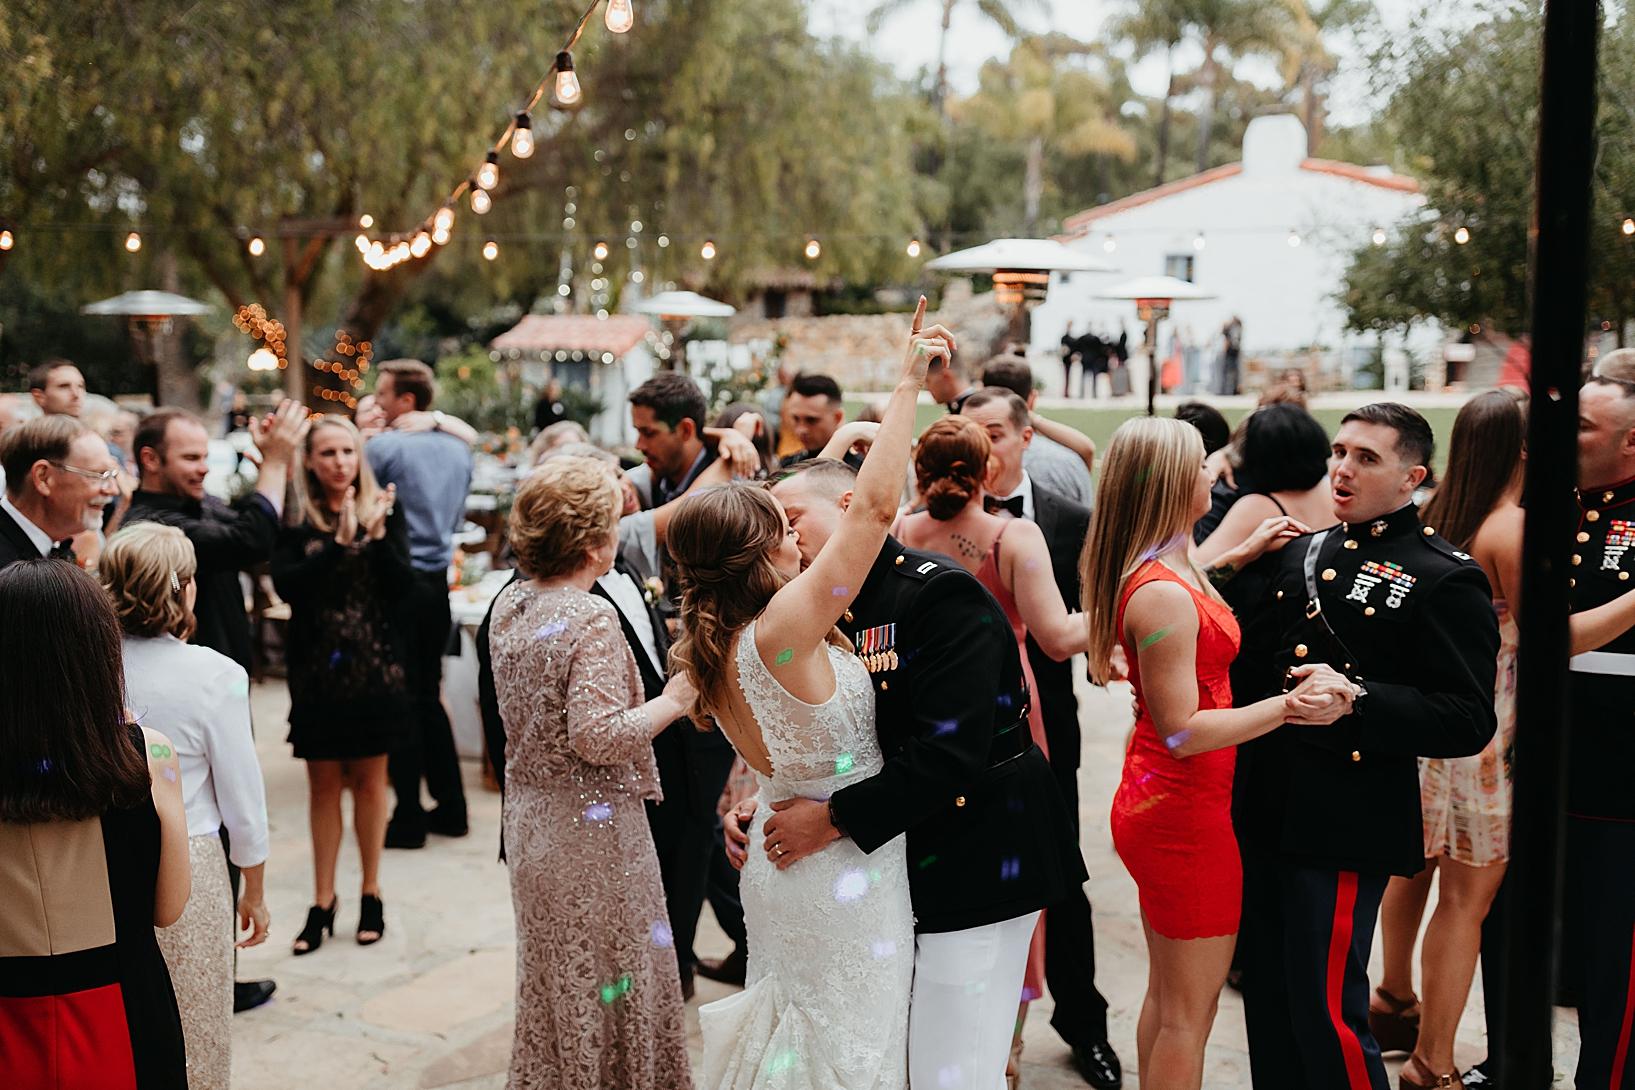 Leo-Carrillo-Ranch-Wedding-124.jpg